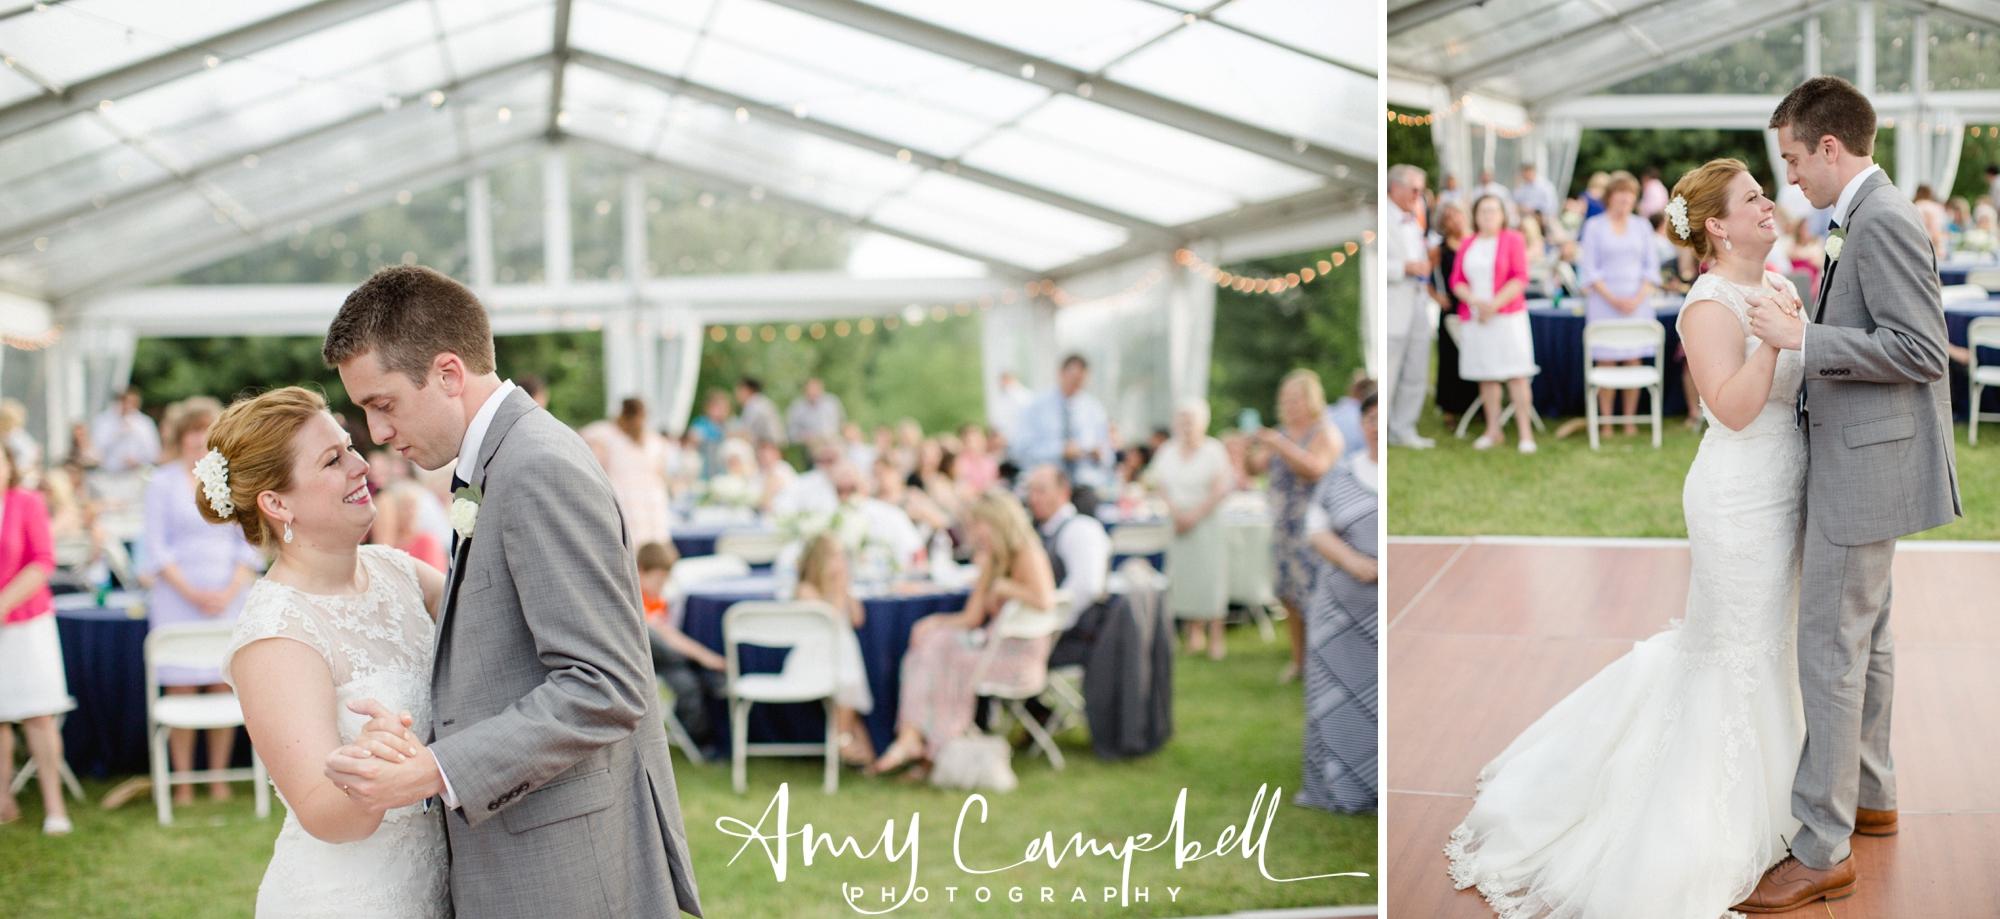 0025_RachelandCurt_FB_AmyCampbellPhotography.jpg